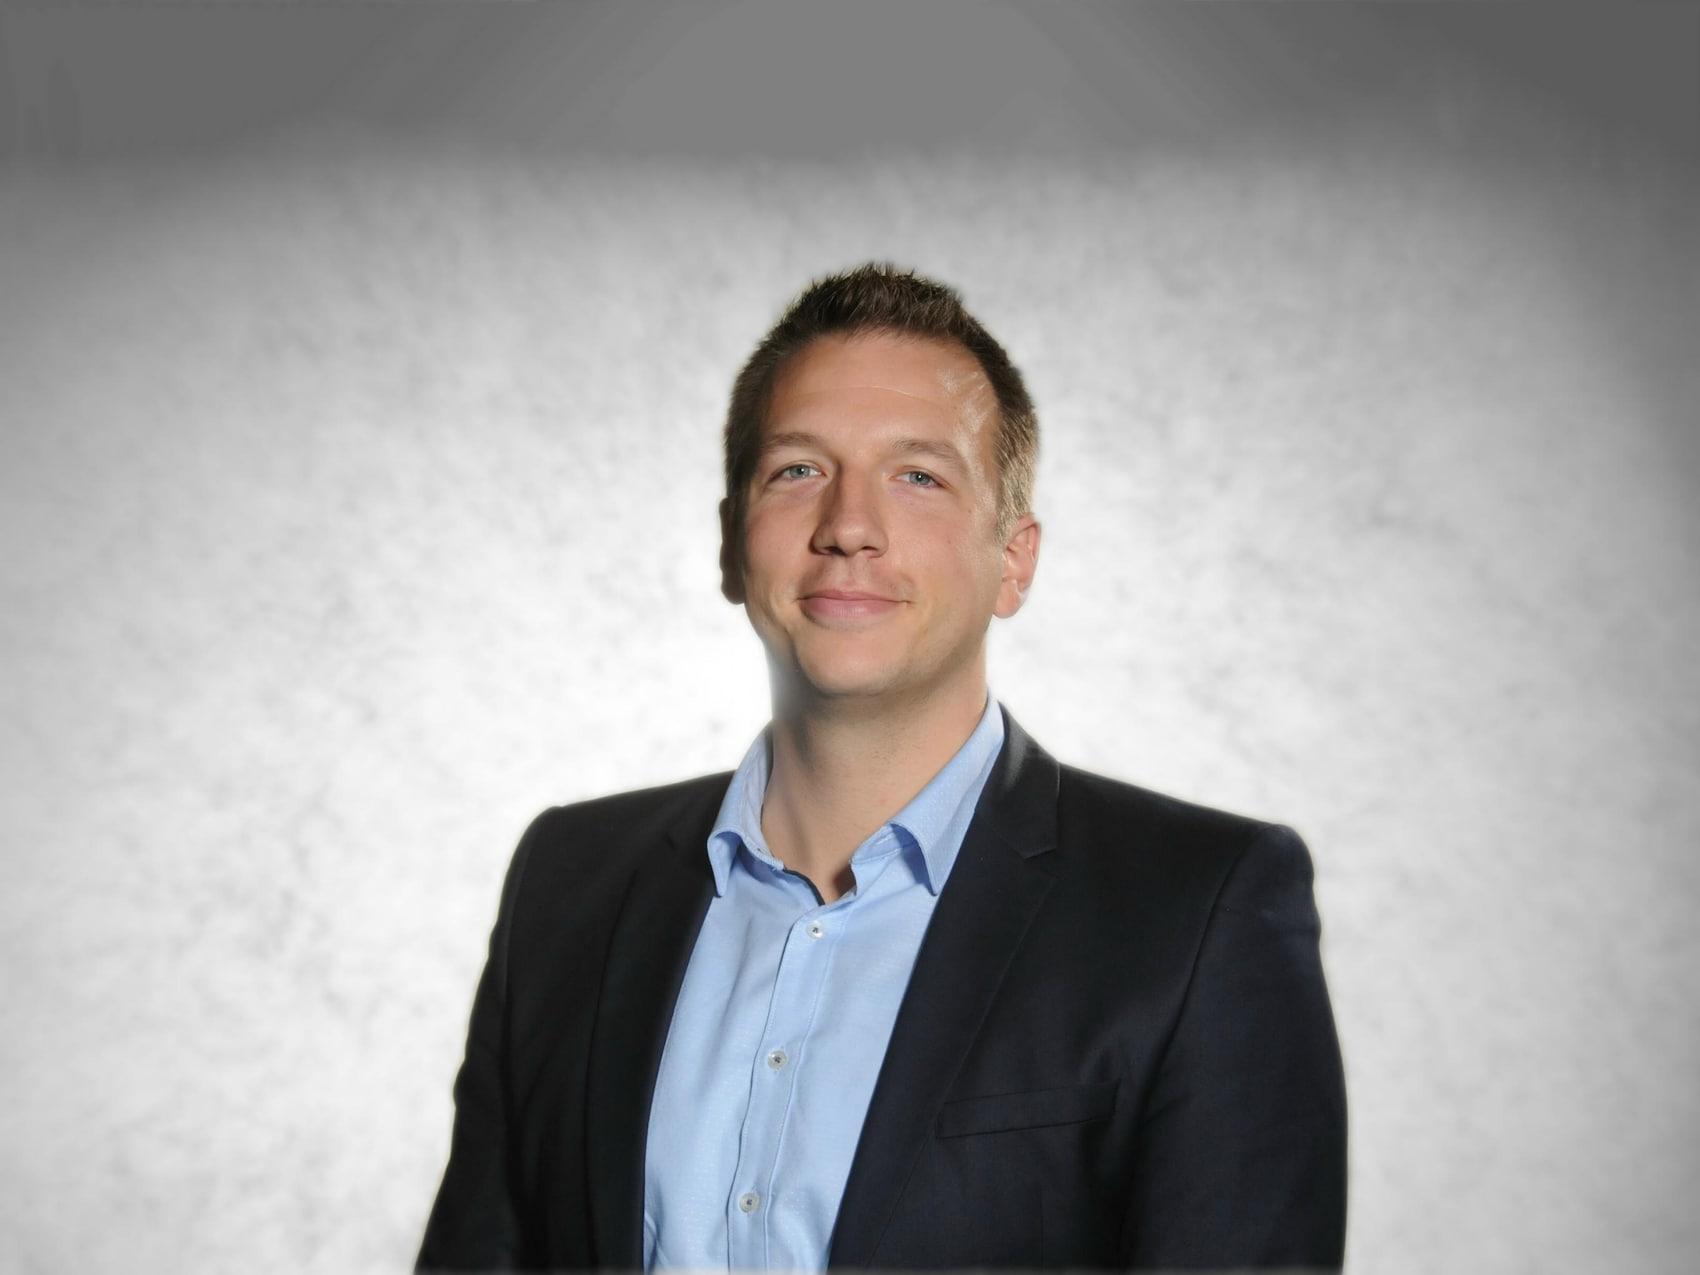 smart Center Pirmasens - Mitarbeiter: Daniel Eder